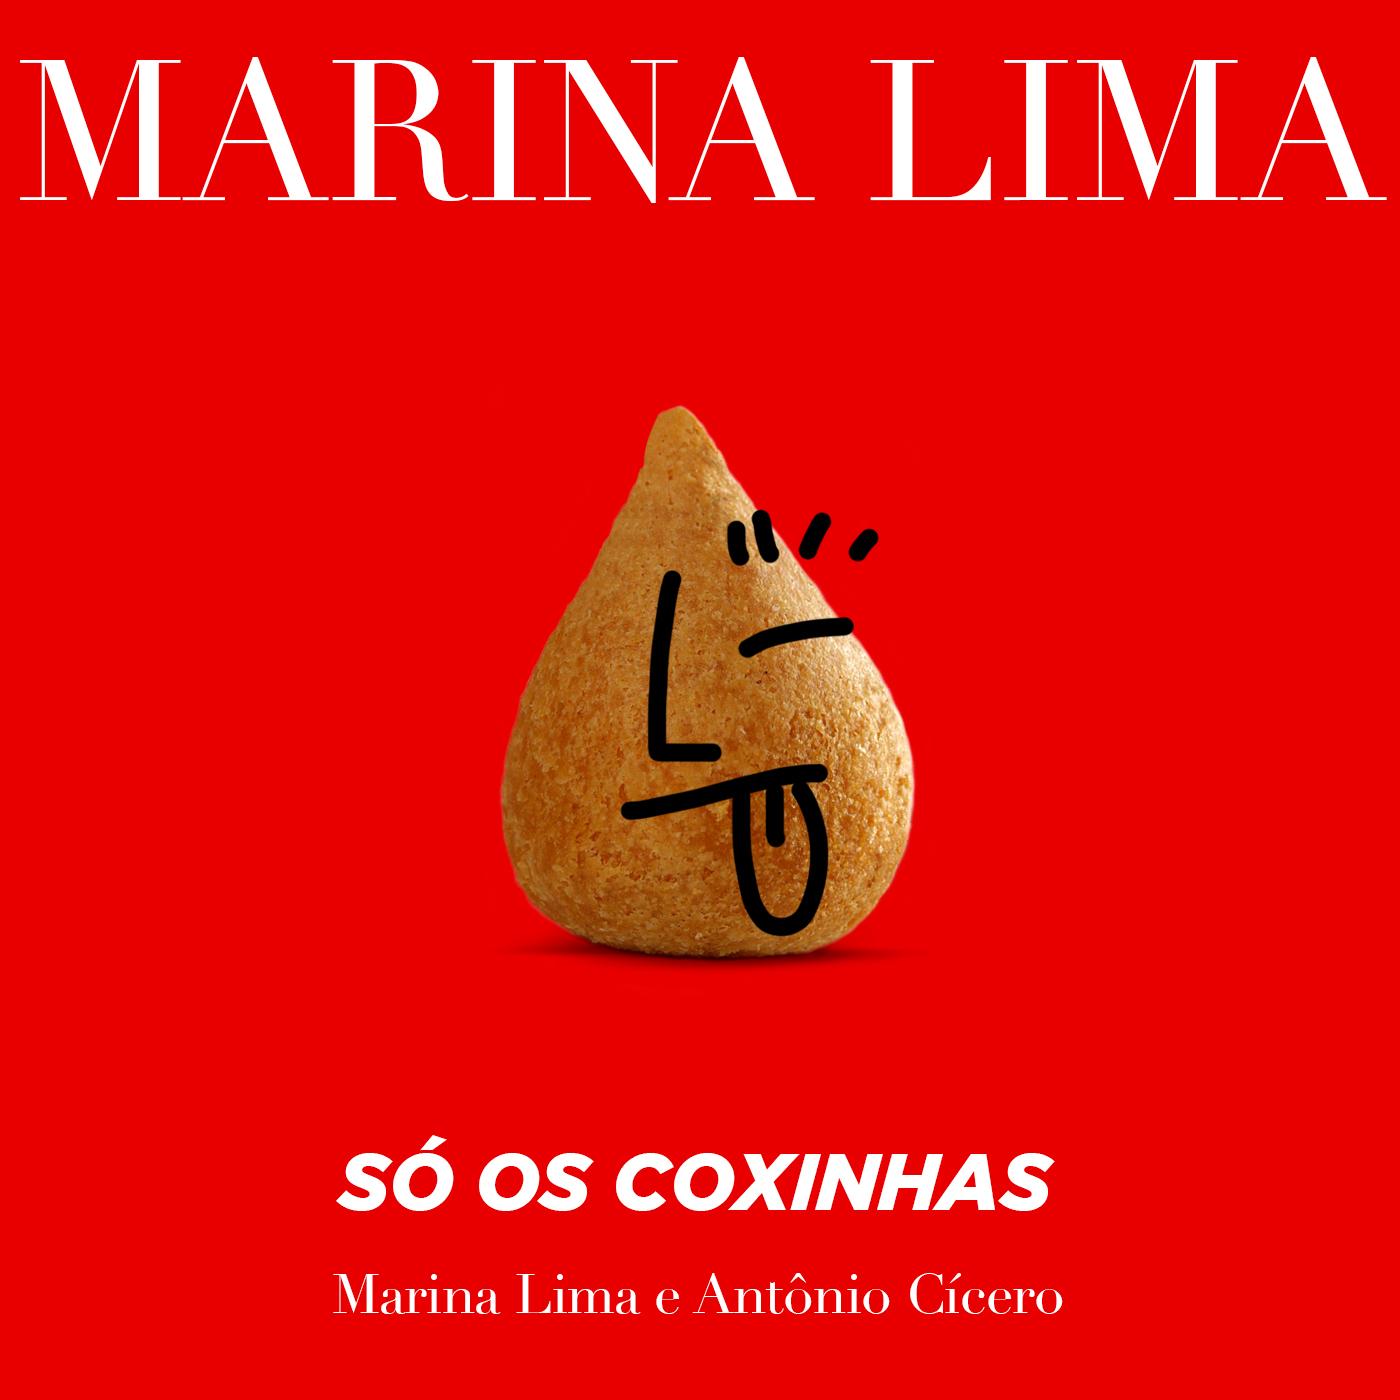 http://marinalima.com.br/wp-content/uploads/2018/01/ML_sooscoxinhas.jpg